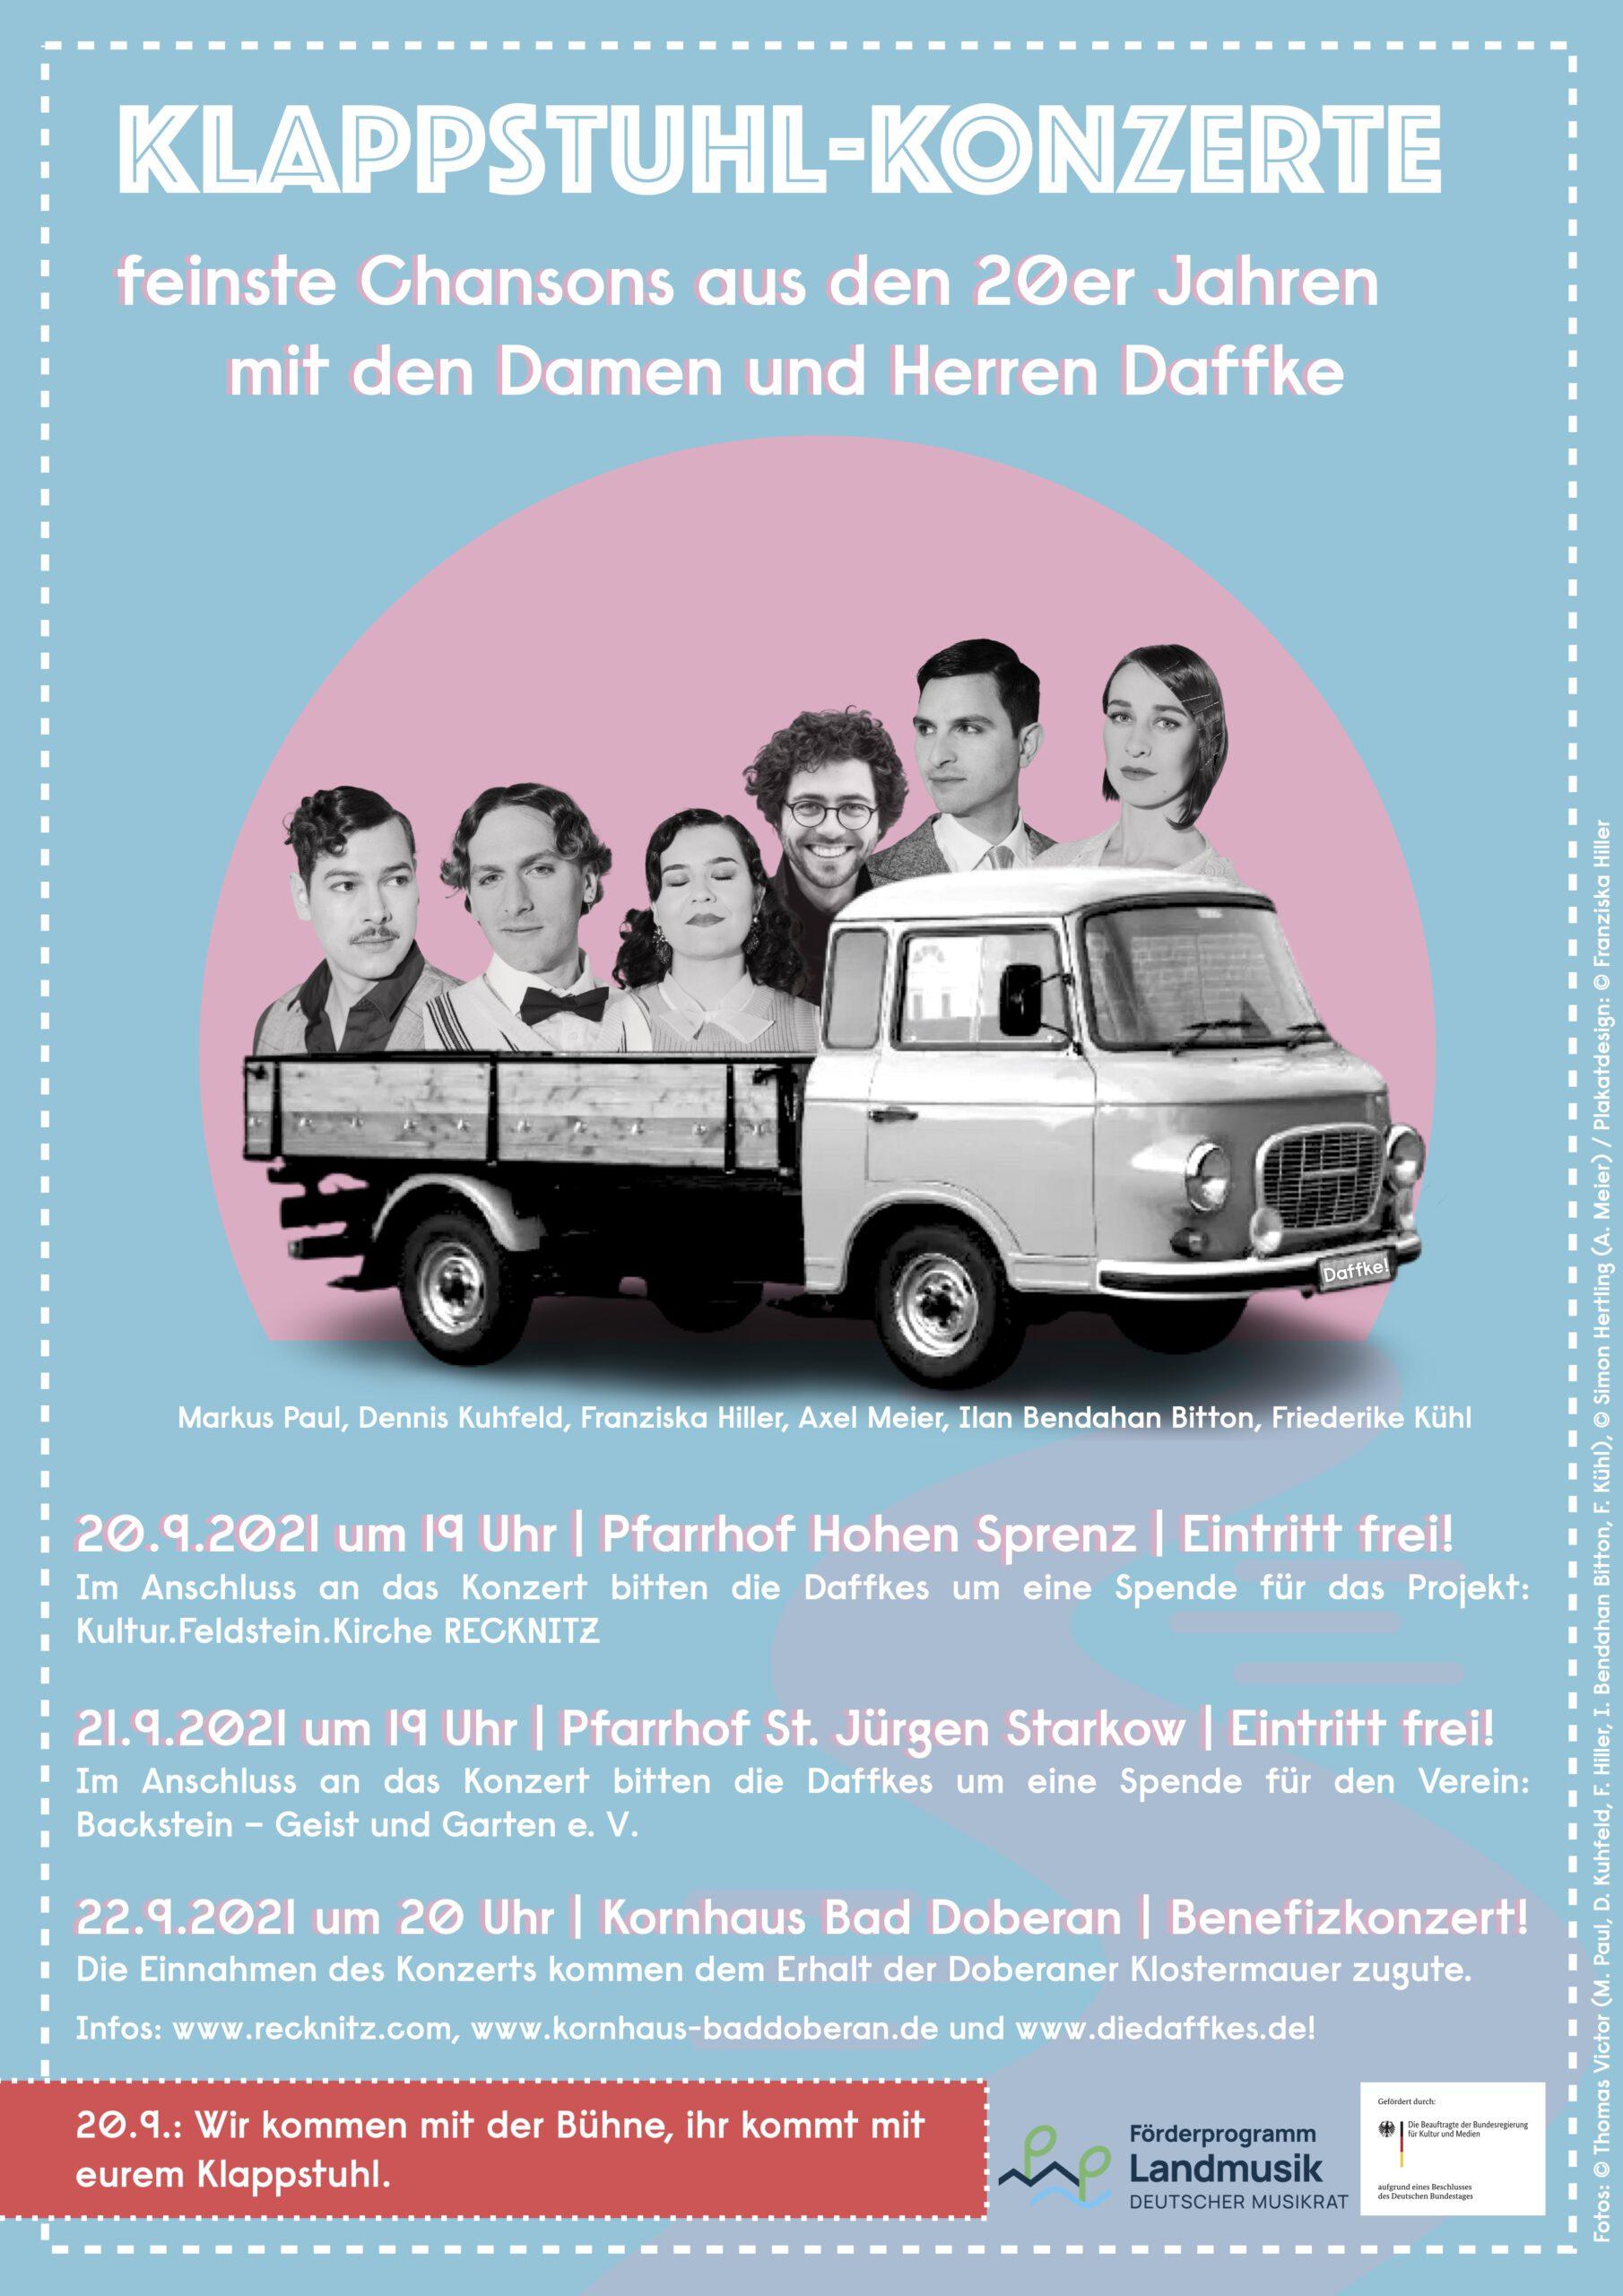 Plakat Klappstuhl-Konzert_alle drei